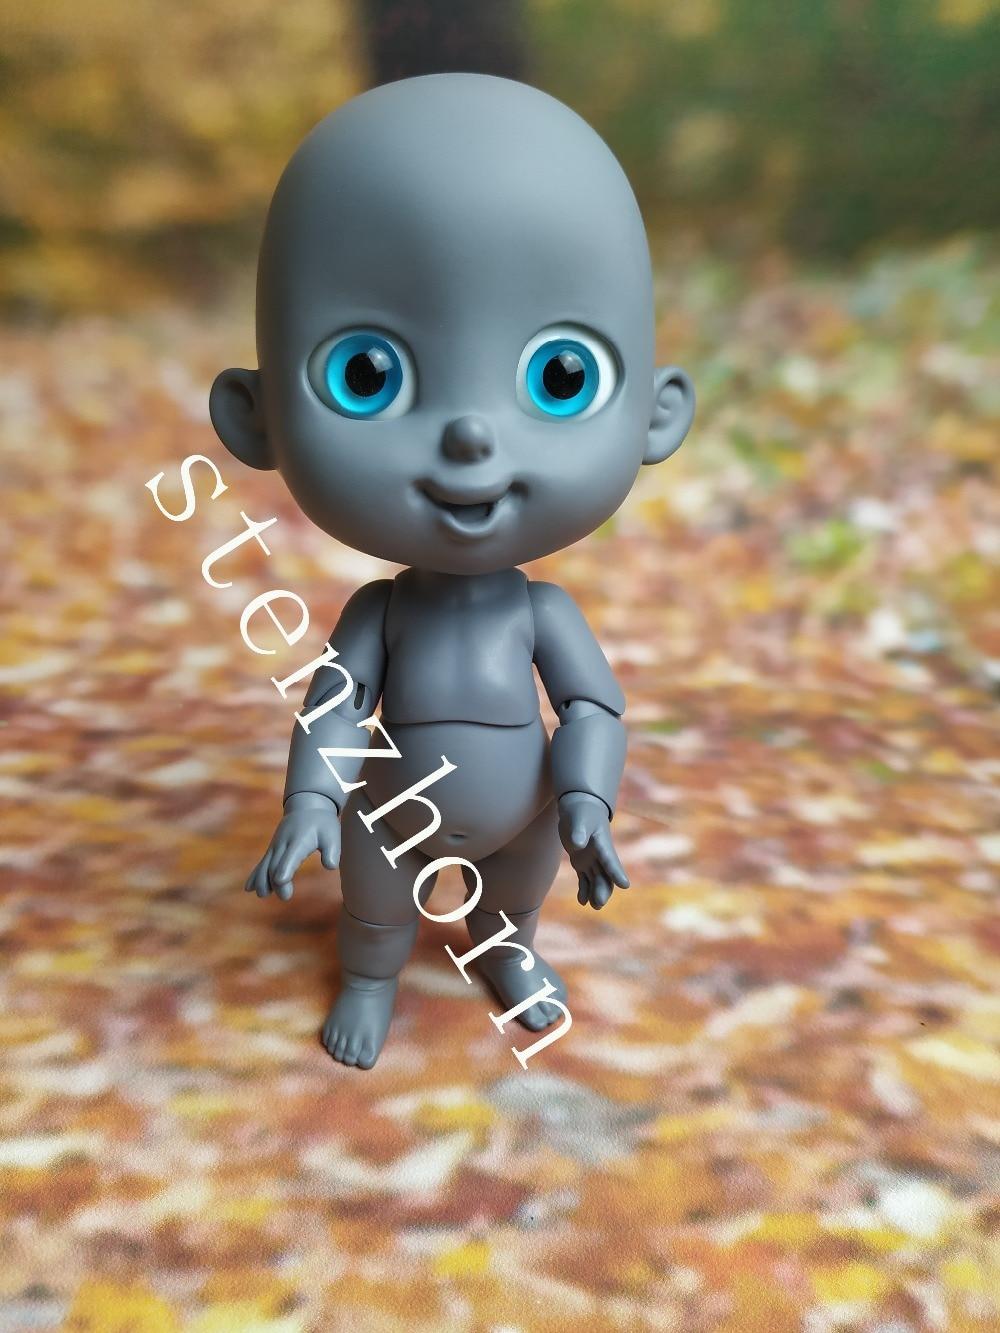 Bjd doll1 8 bean bag cute baby doLL toy fashion bjd free eyes